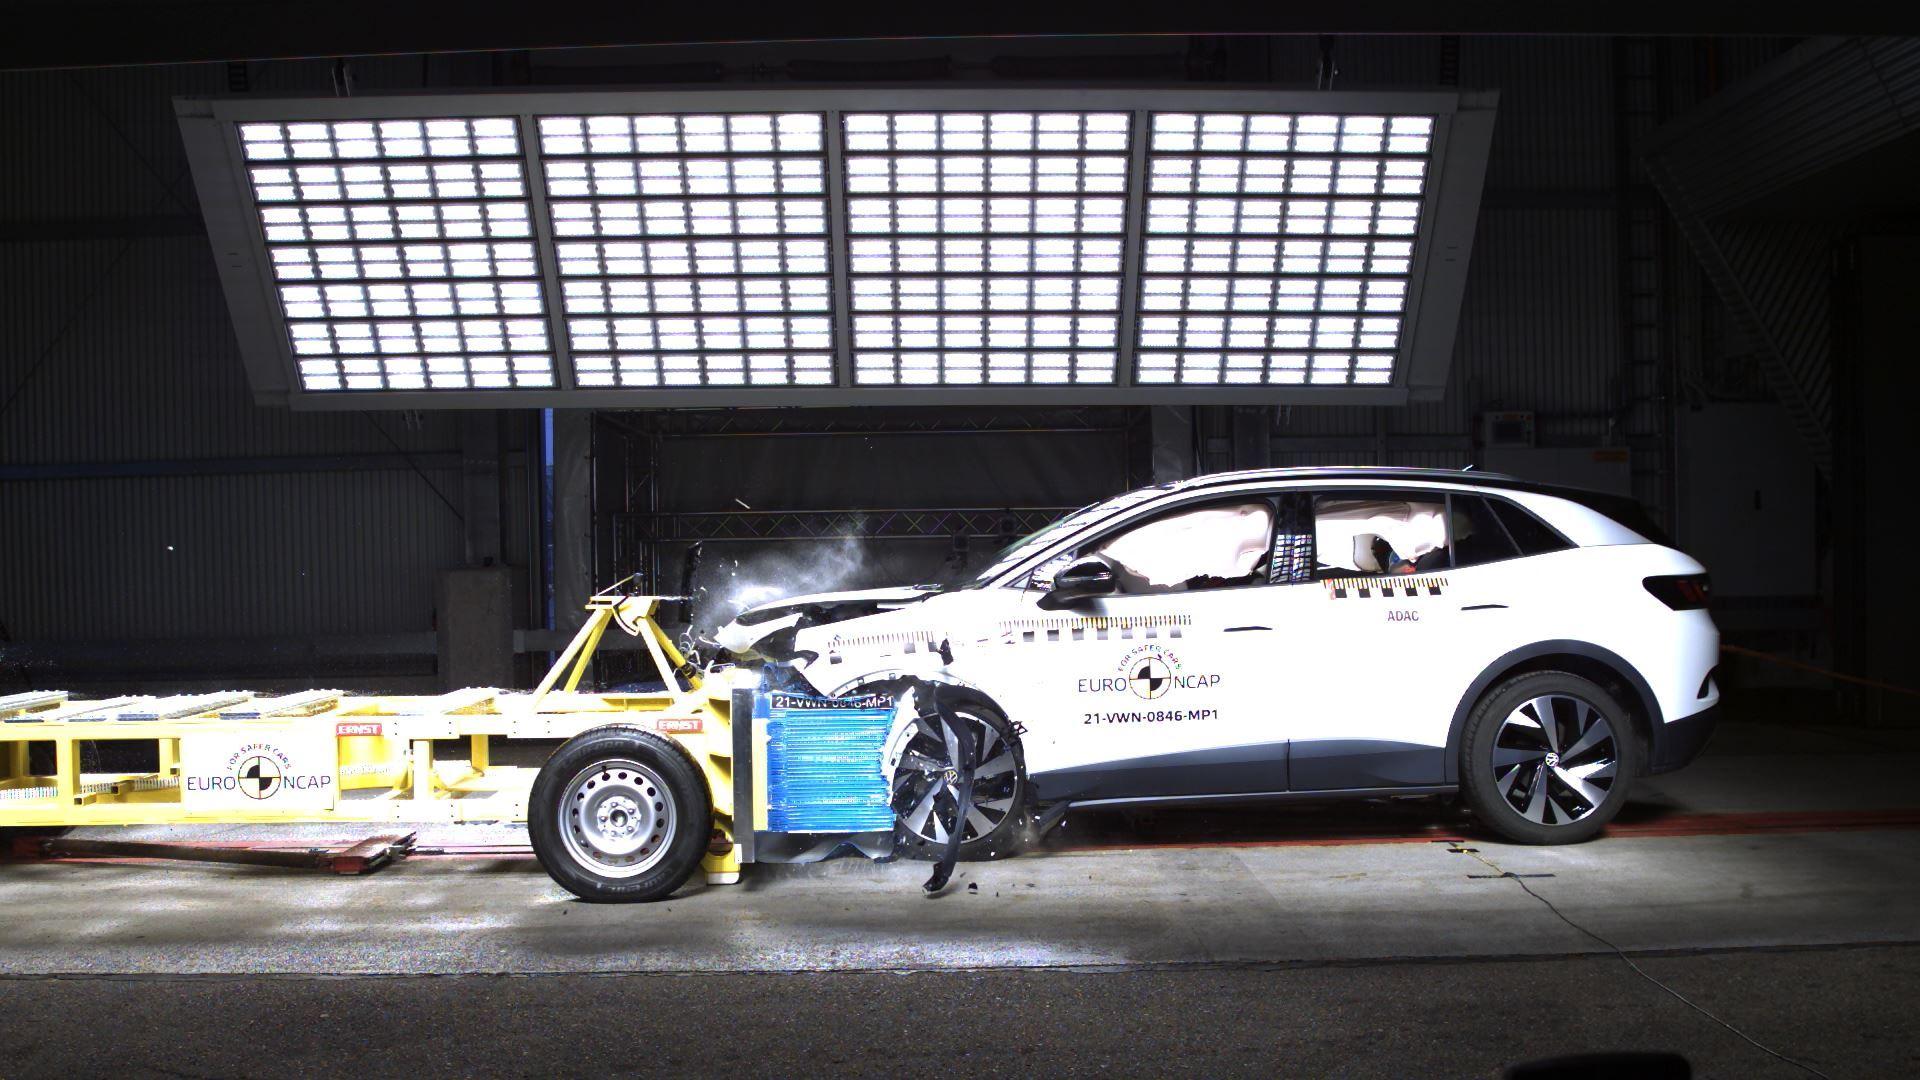 VW ID.4 - Mobile Progressive Deformable Barrier test 2021